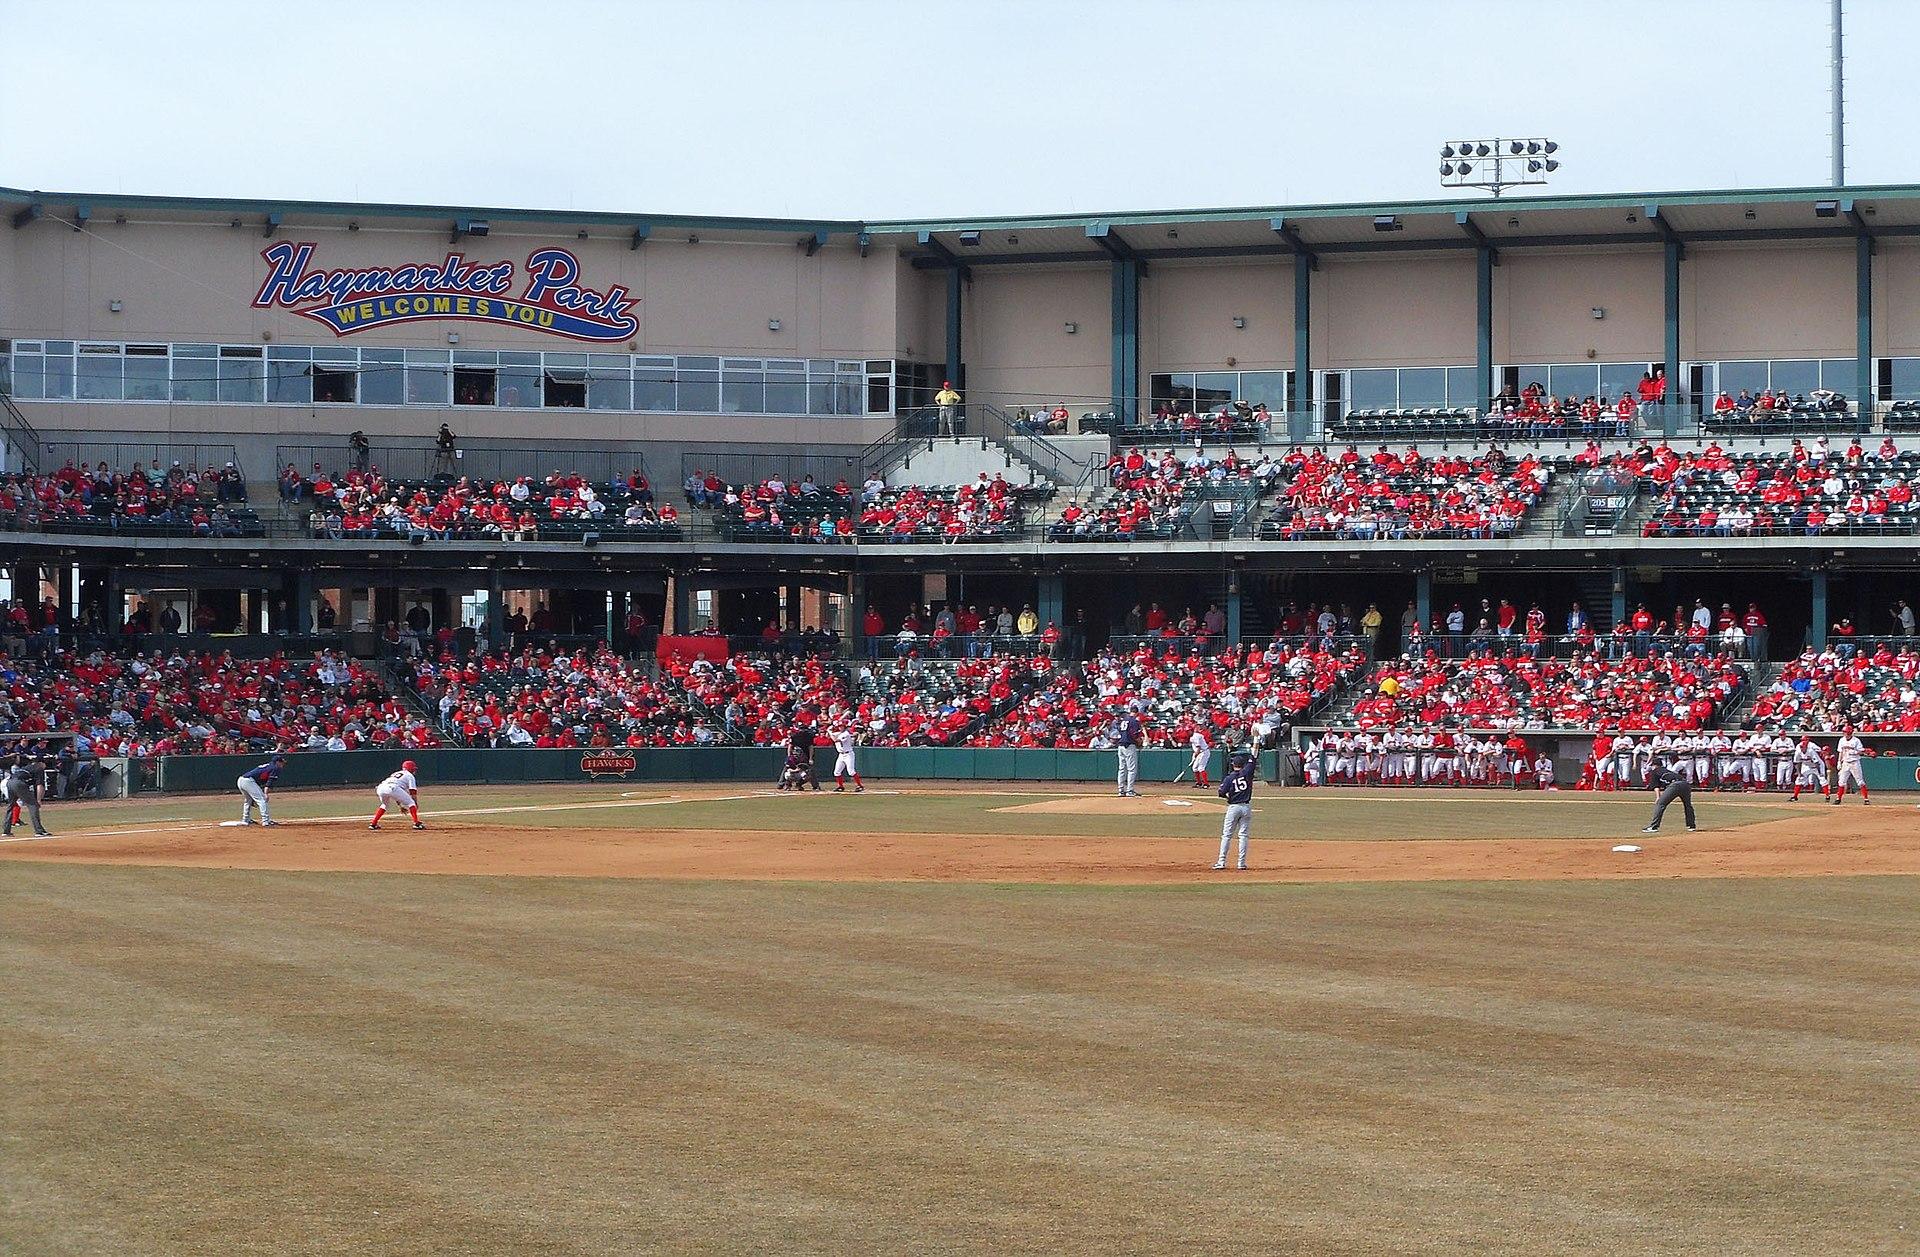 Nebraska Cornhuskers baseball - Wikipedia